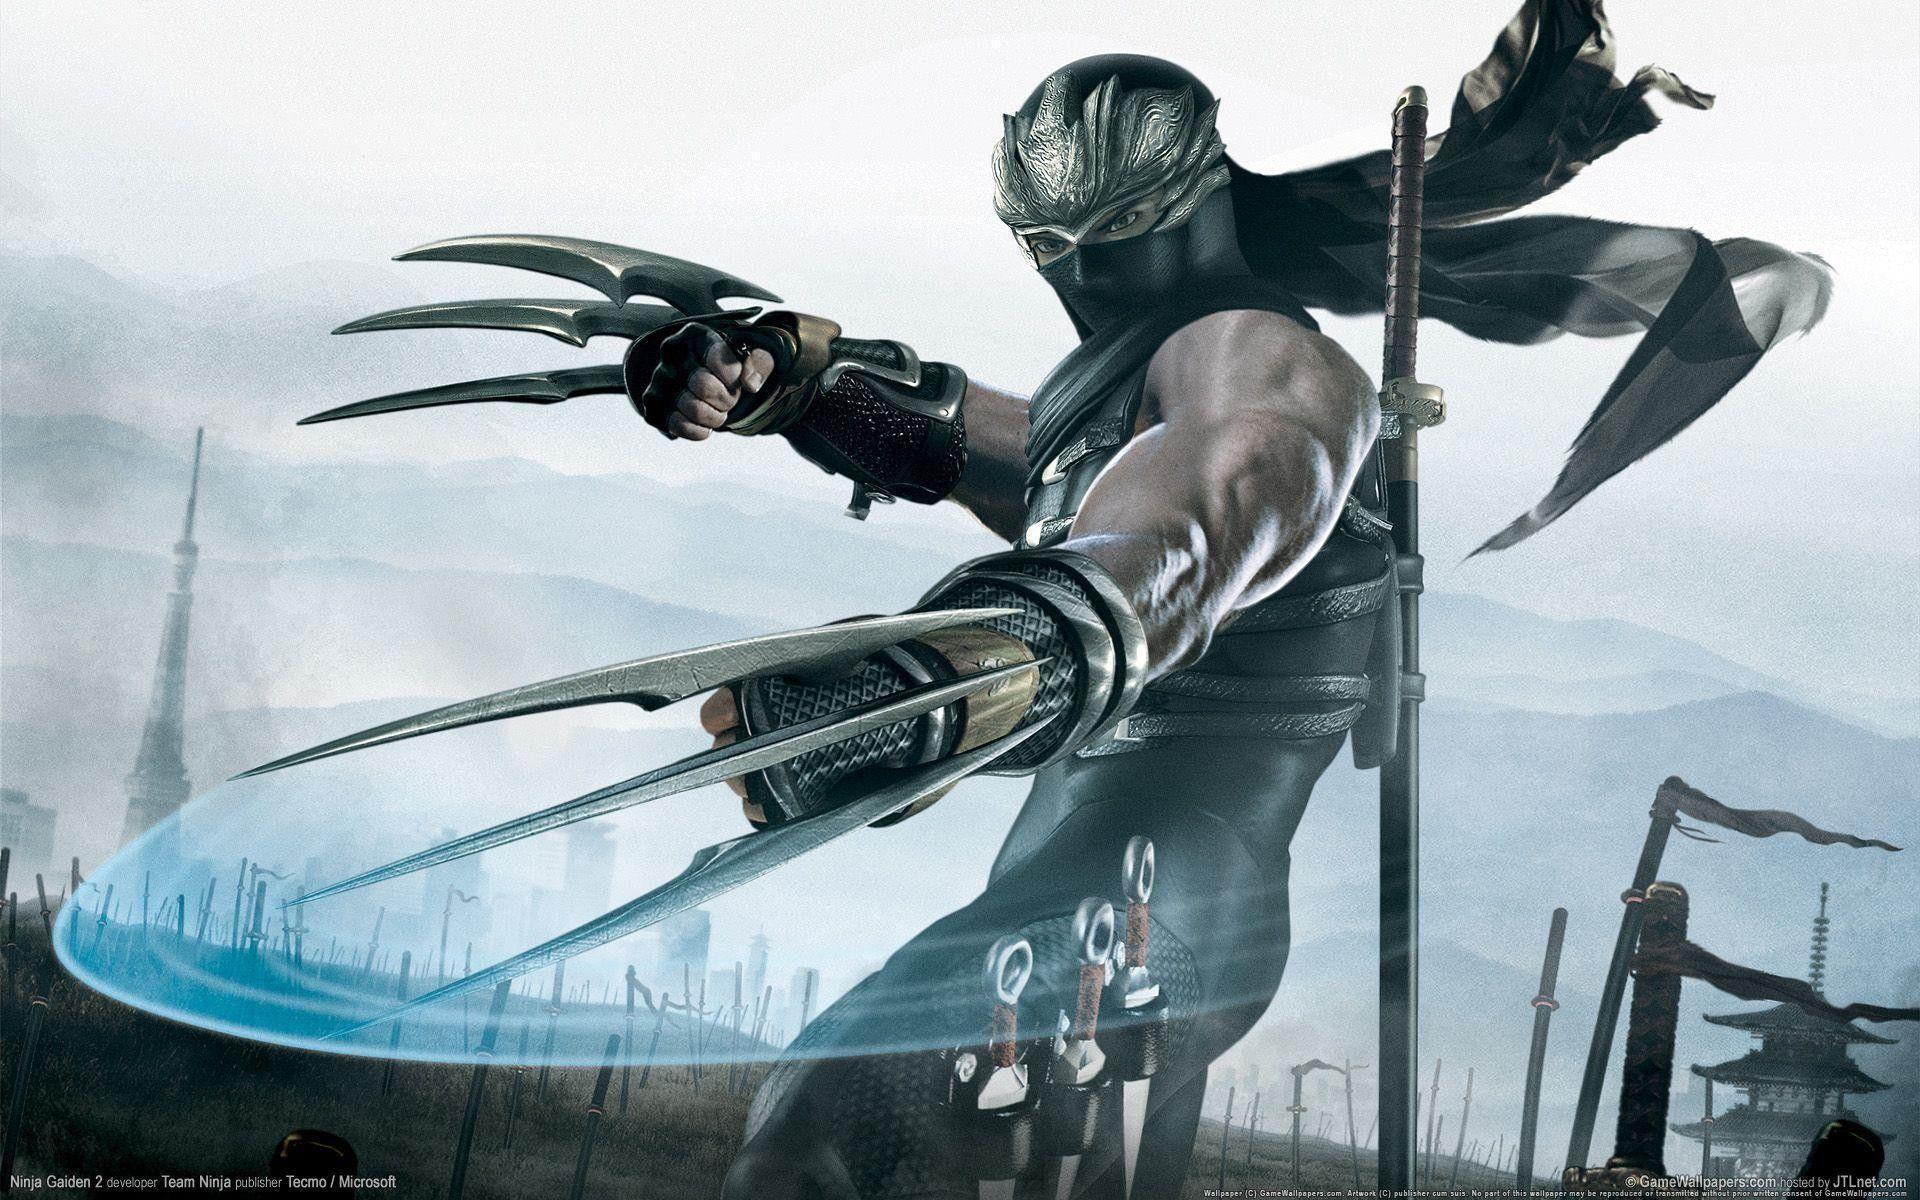 ninja assassin full movie free download in english